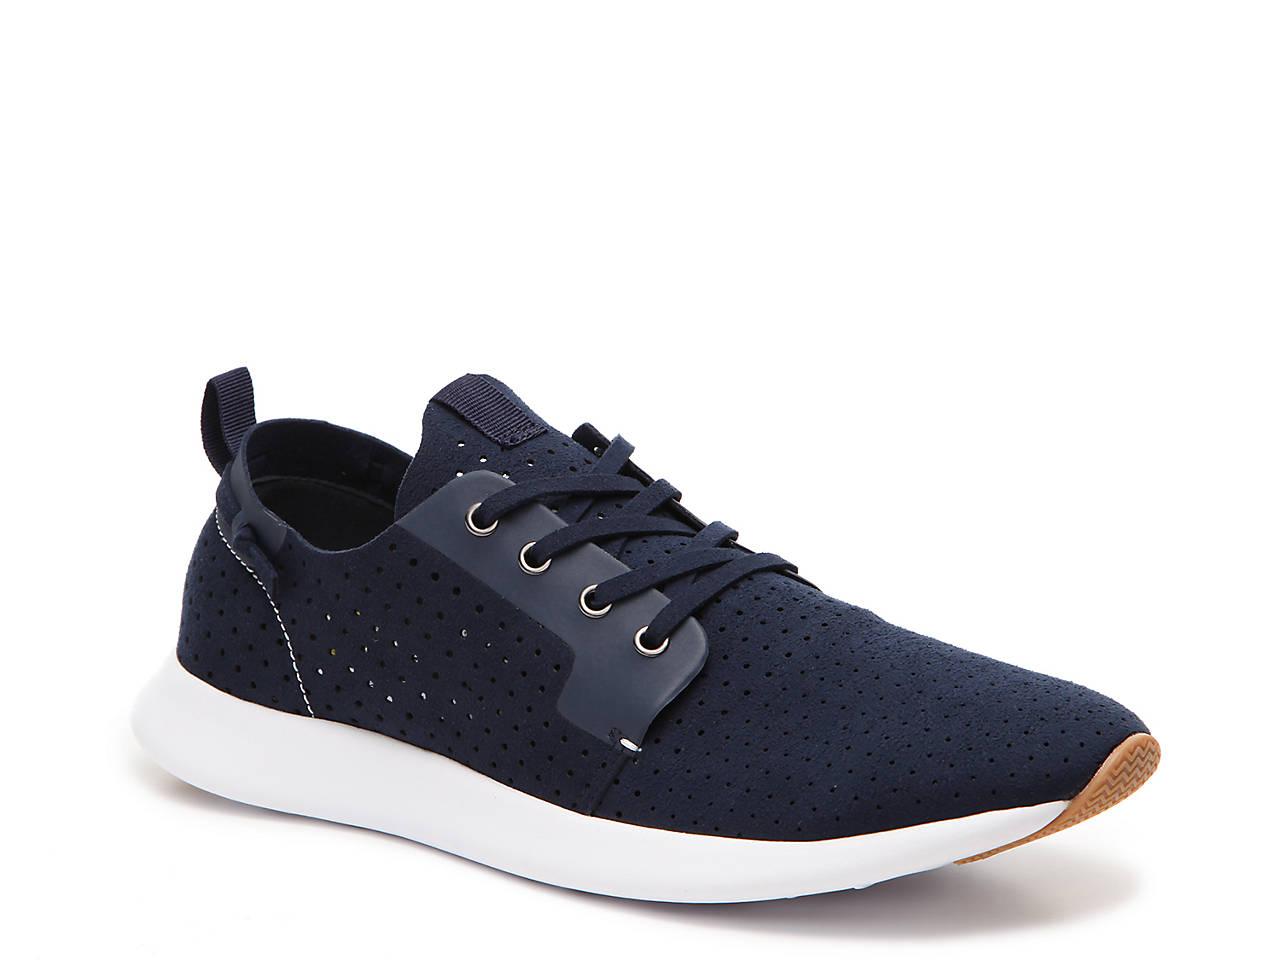 2726a8c076e Steve Madden Brixxon Sneaker Men s Shoes